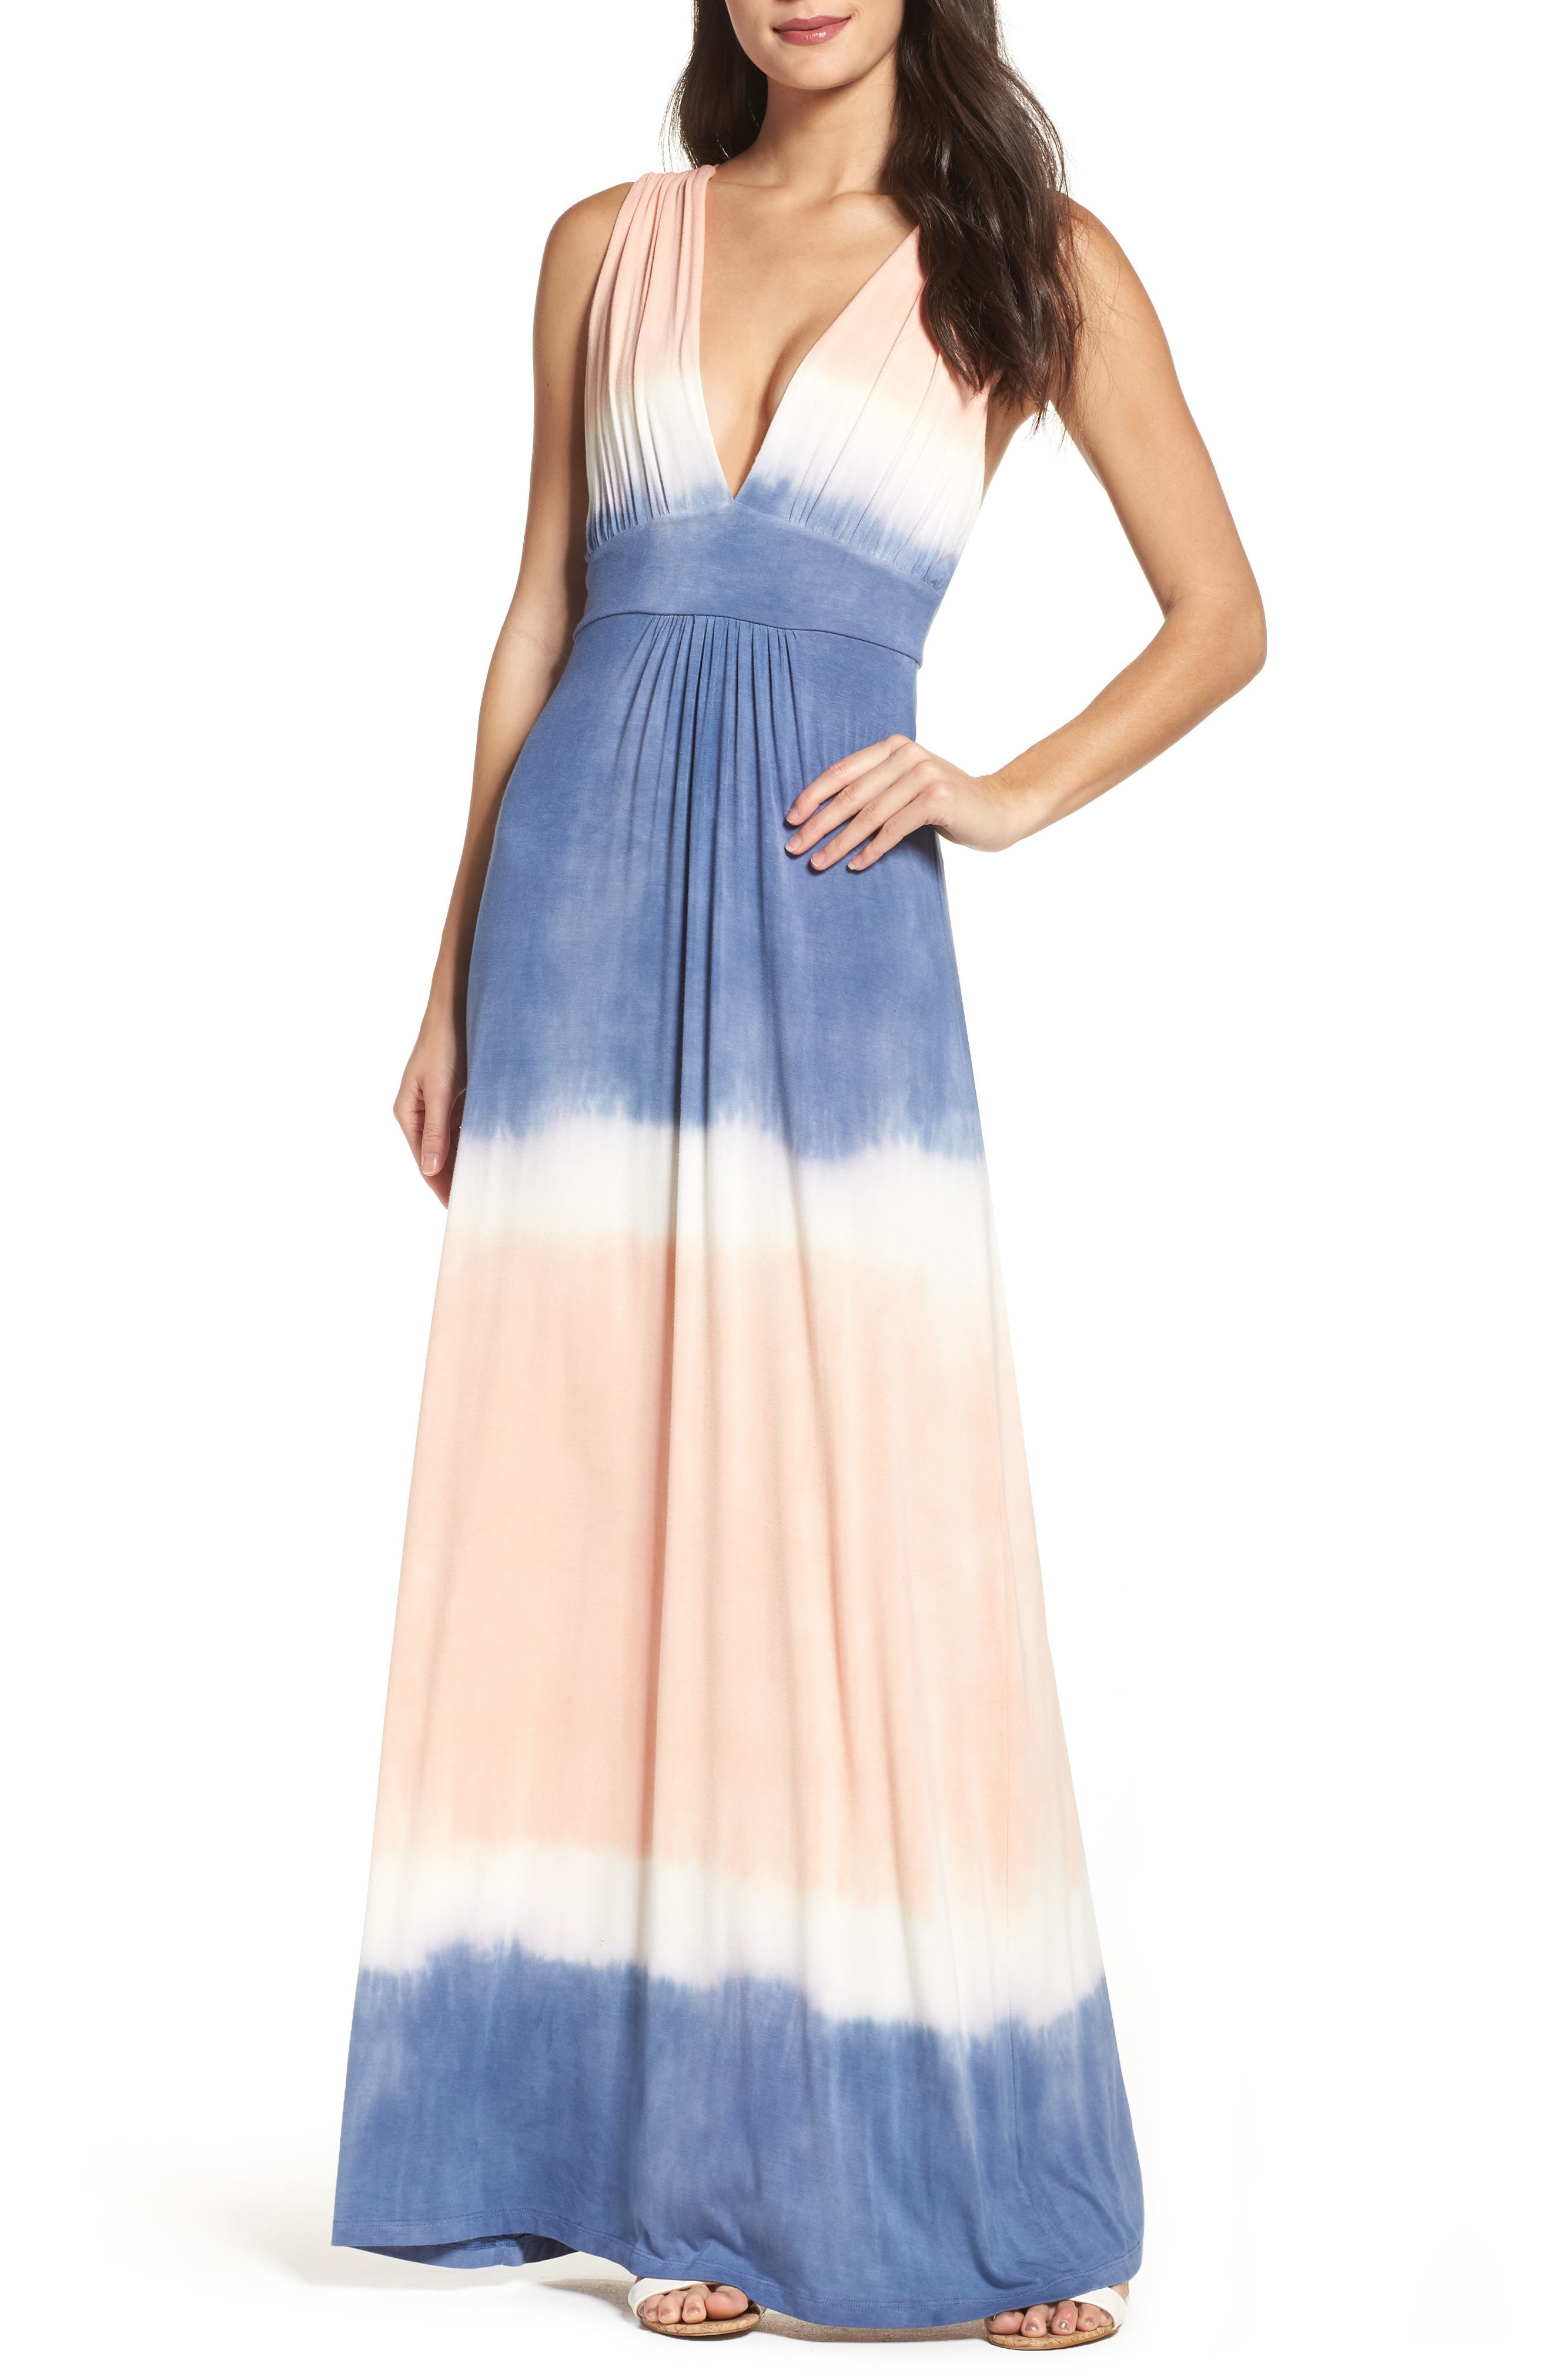 Tie Dye Sleeveless Maxi Dress,                         Main,                         color, Blue/ White